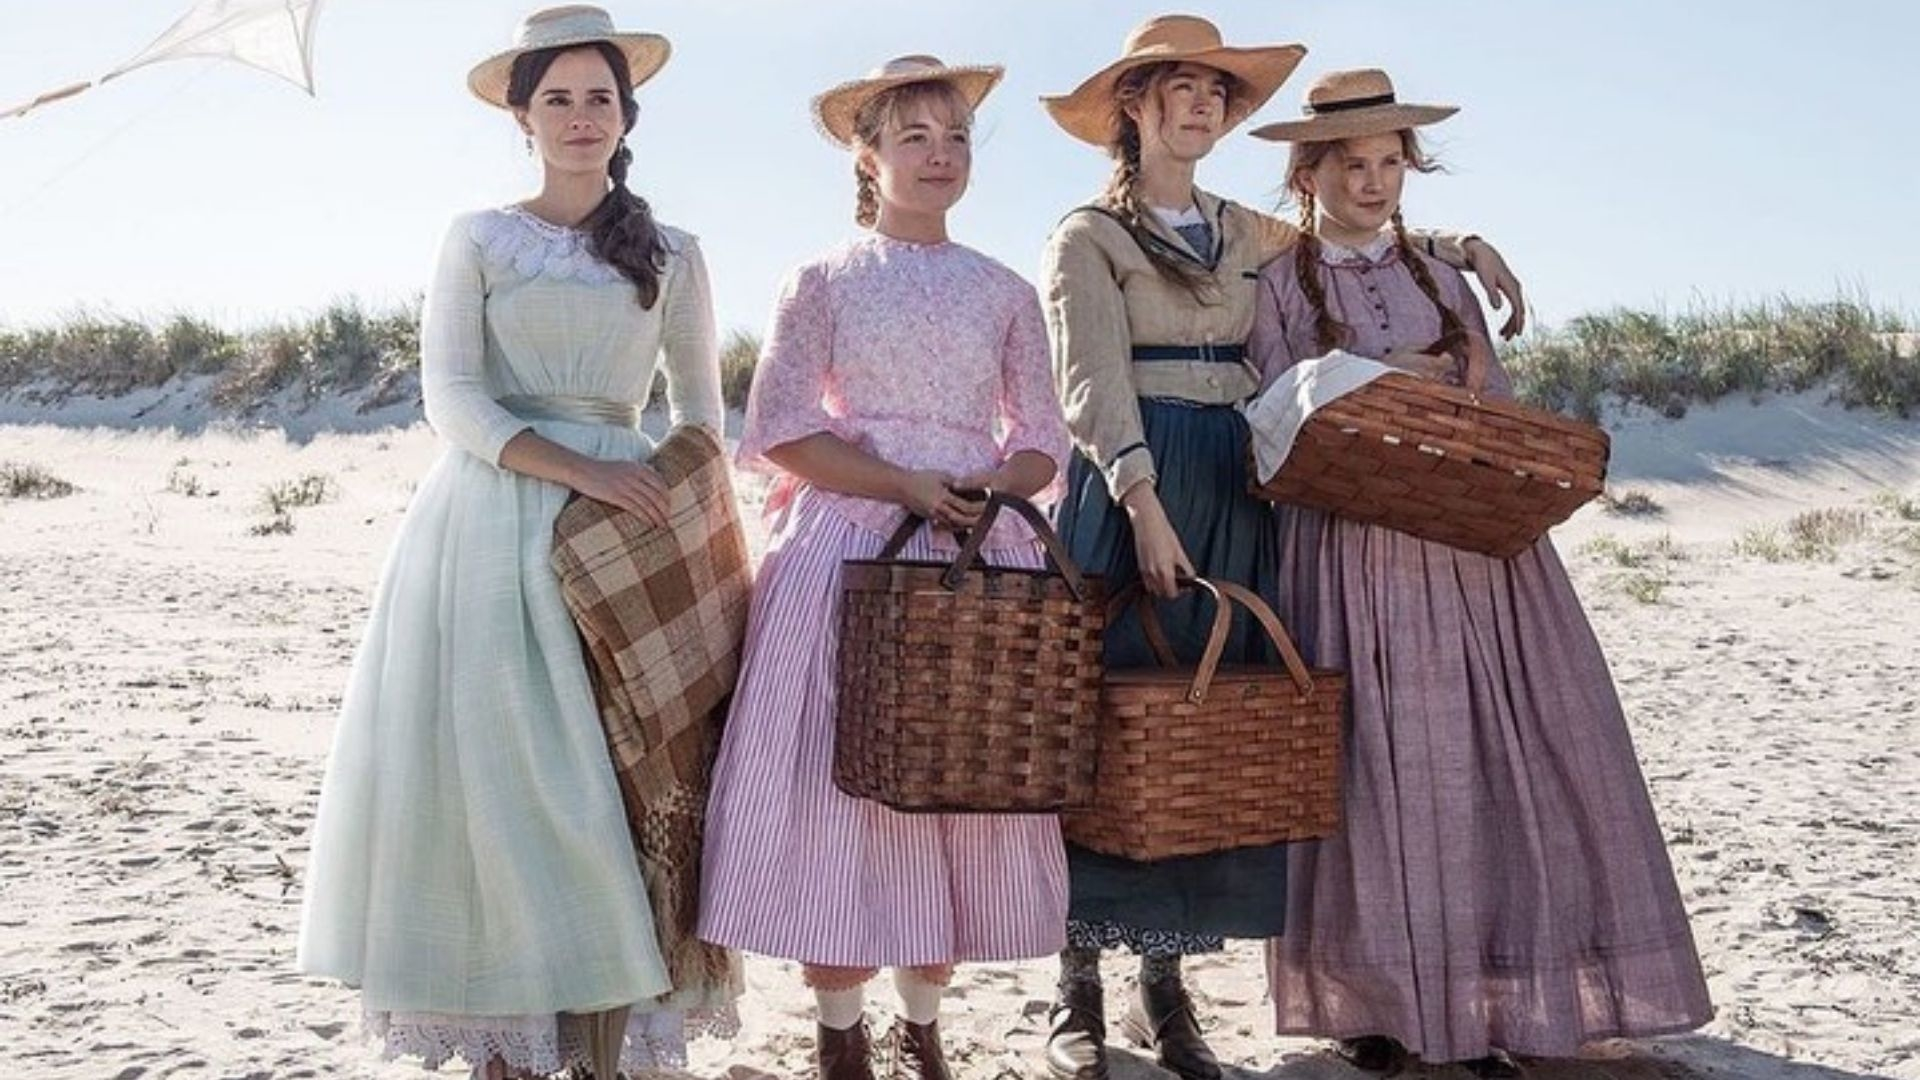 The Little Women Trailer, Starring Emma Watson And Saoirse Ronan, Has Finally Arrived